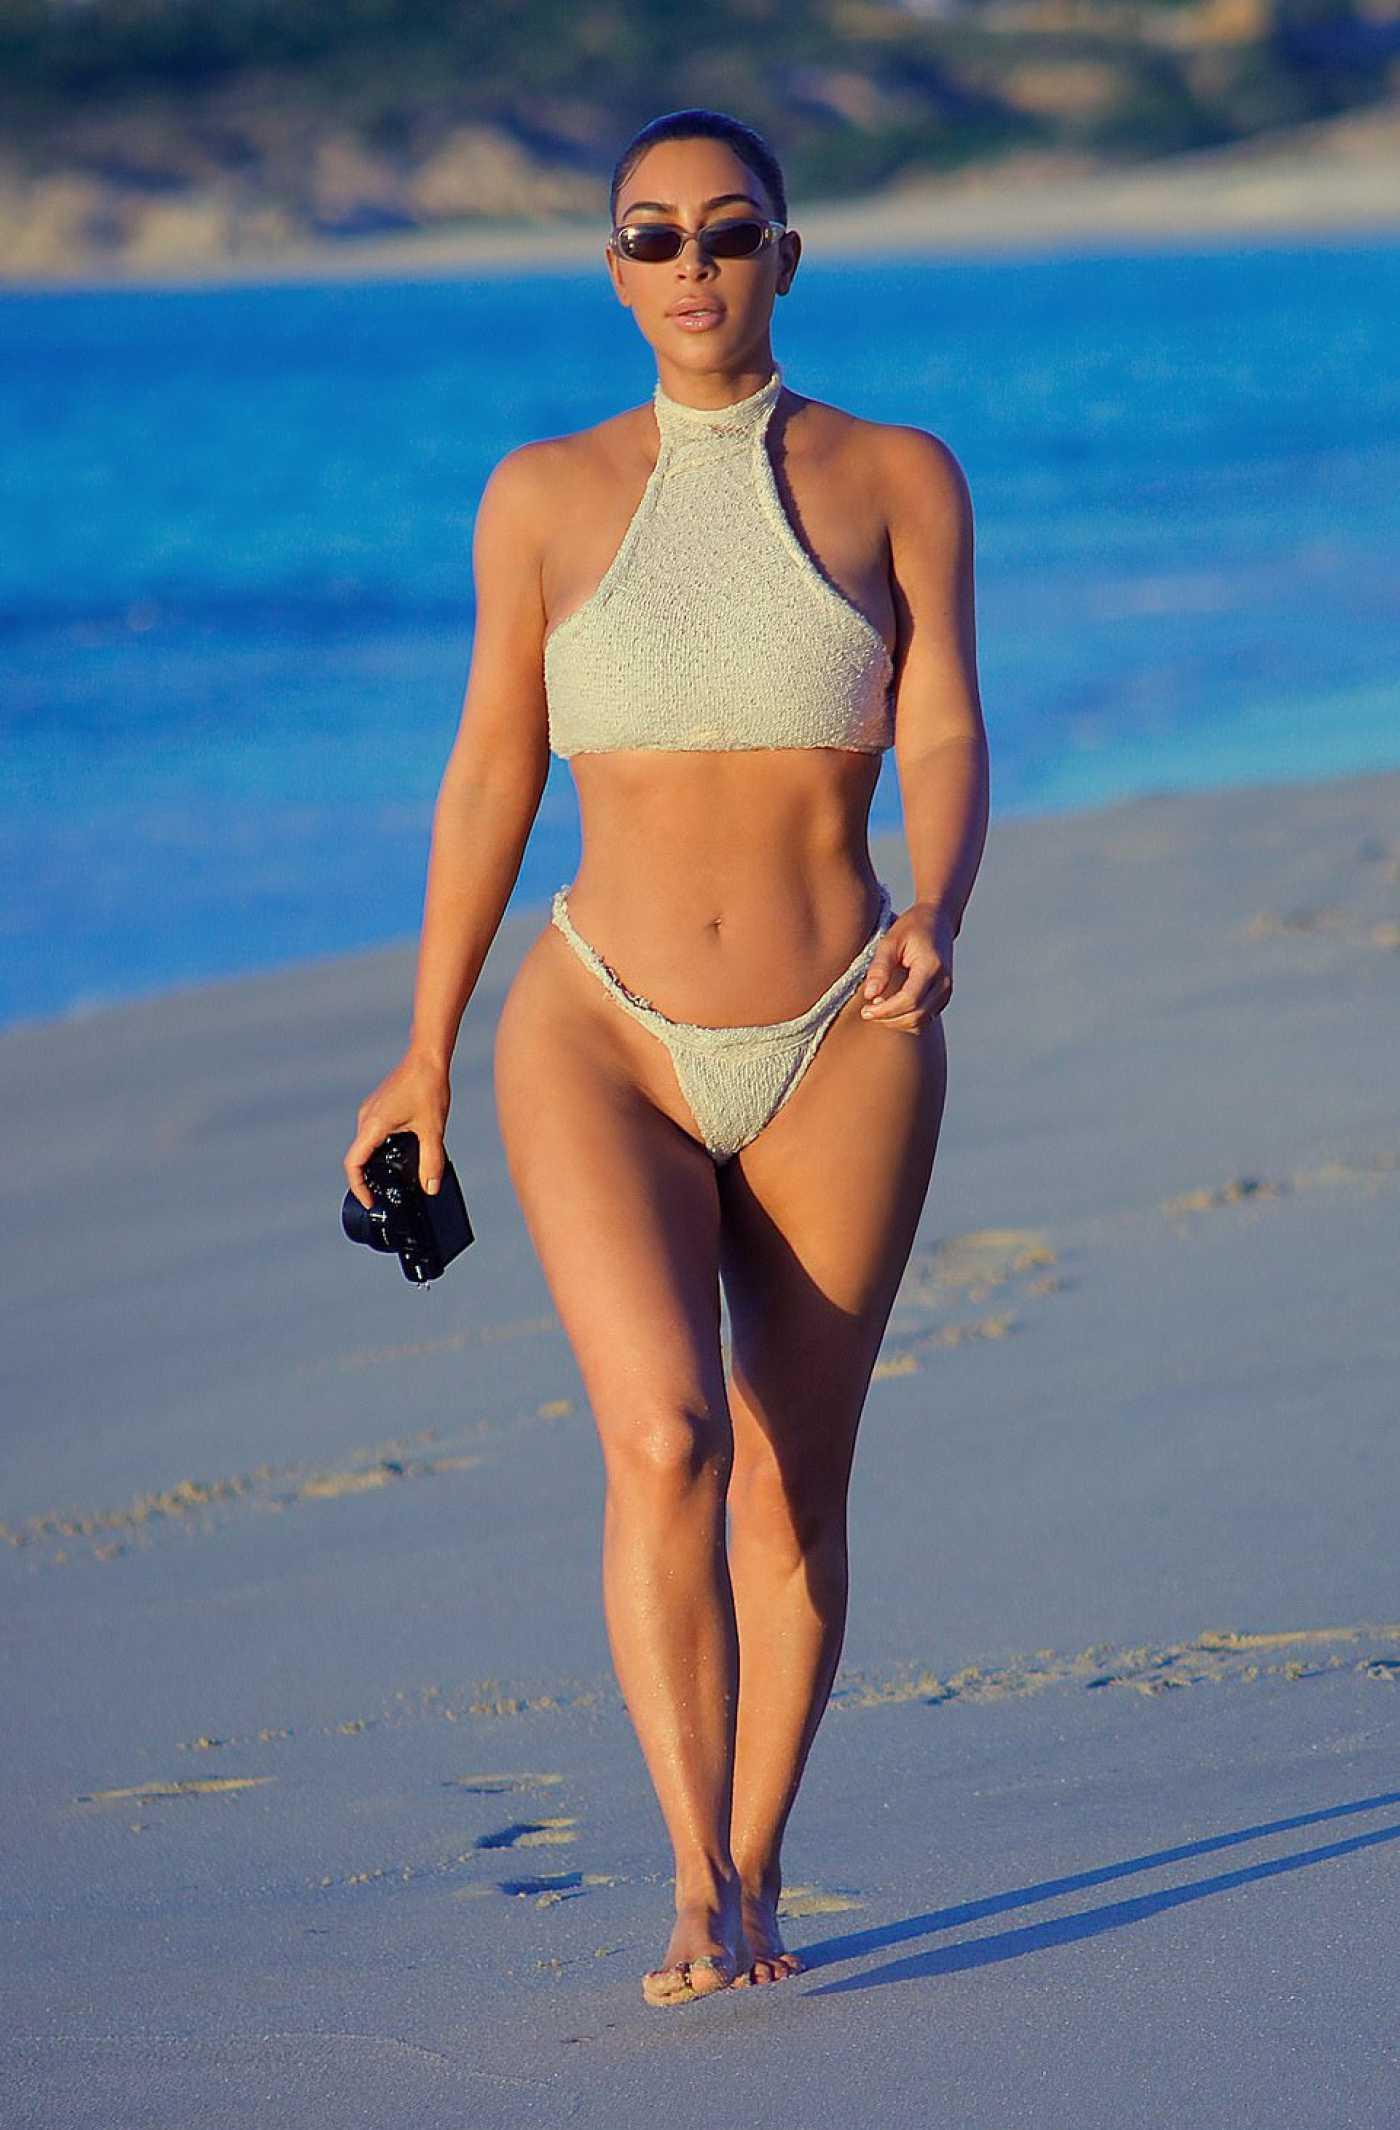 Kim Kardashian in a Beige Bikini on the Beach in Mexico 01/14/2020